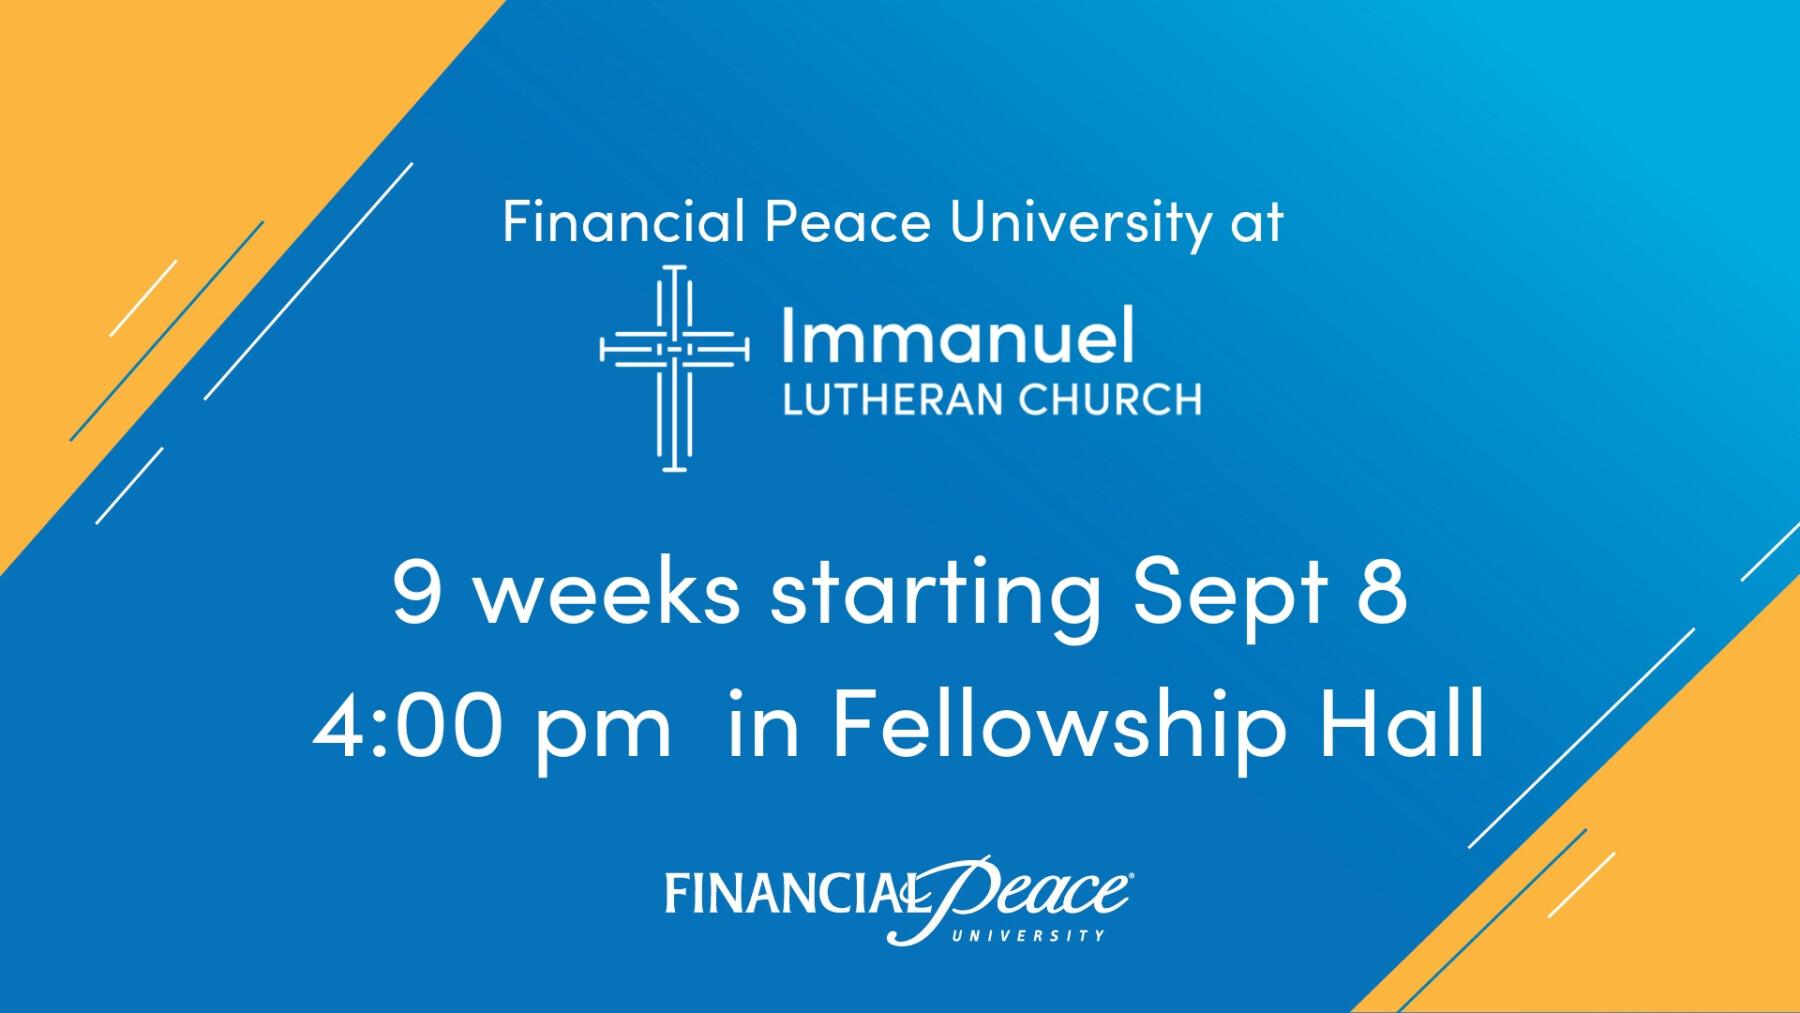 Financial Peace University Fall 2019